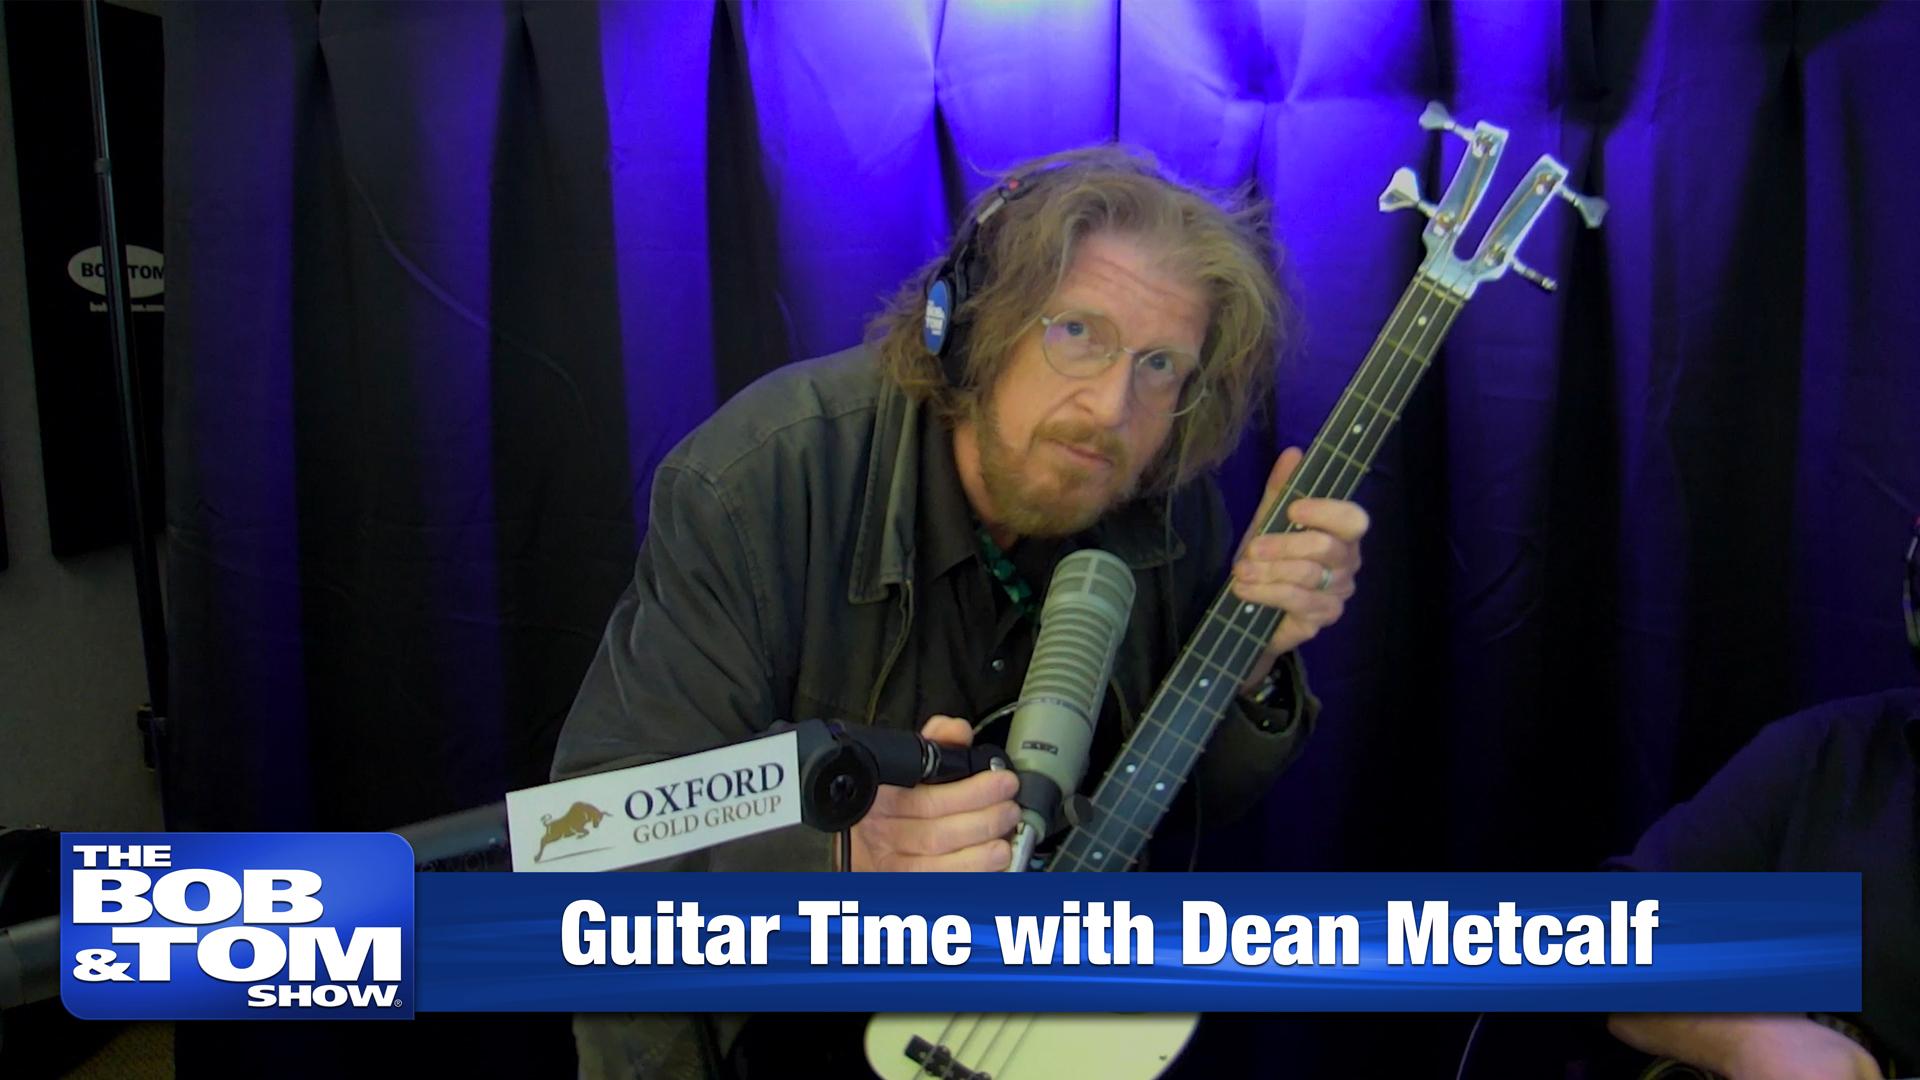 Guitar Time with Dean Metcalf